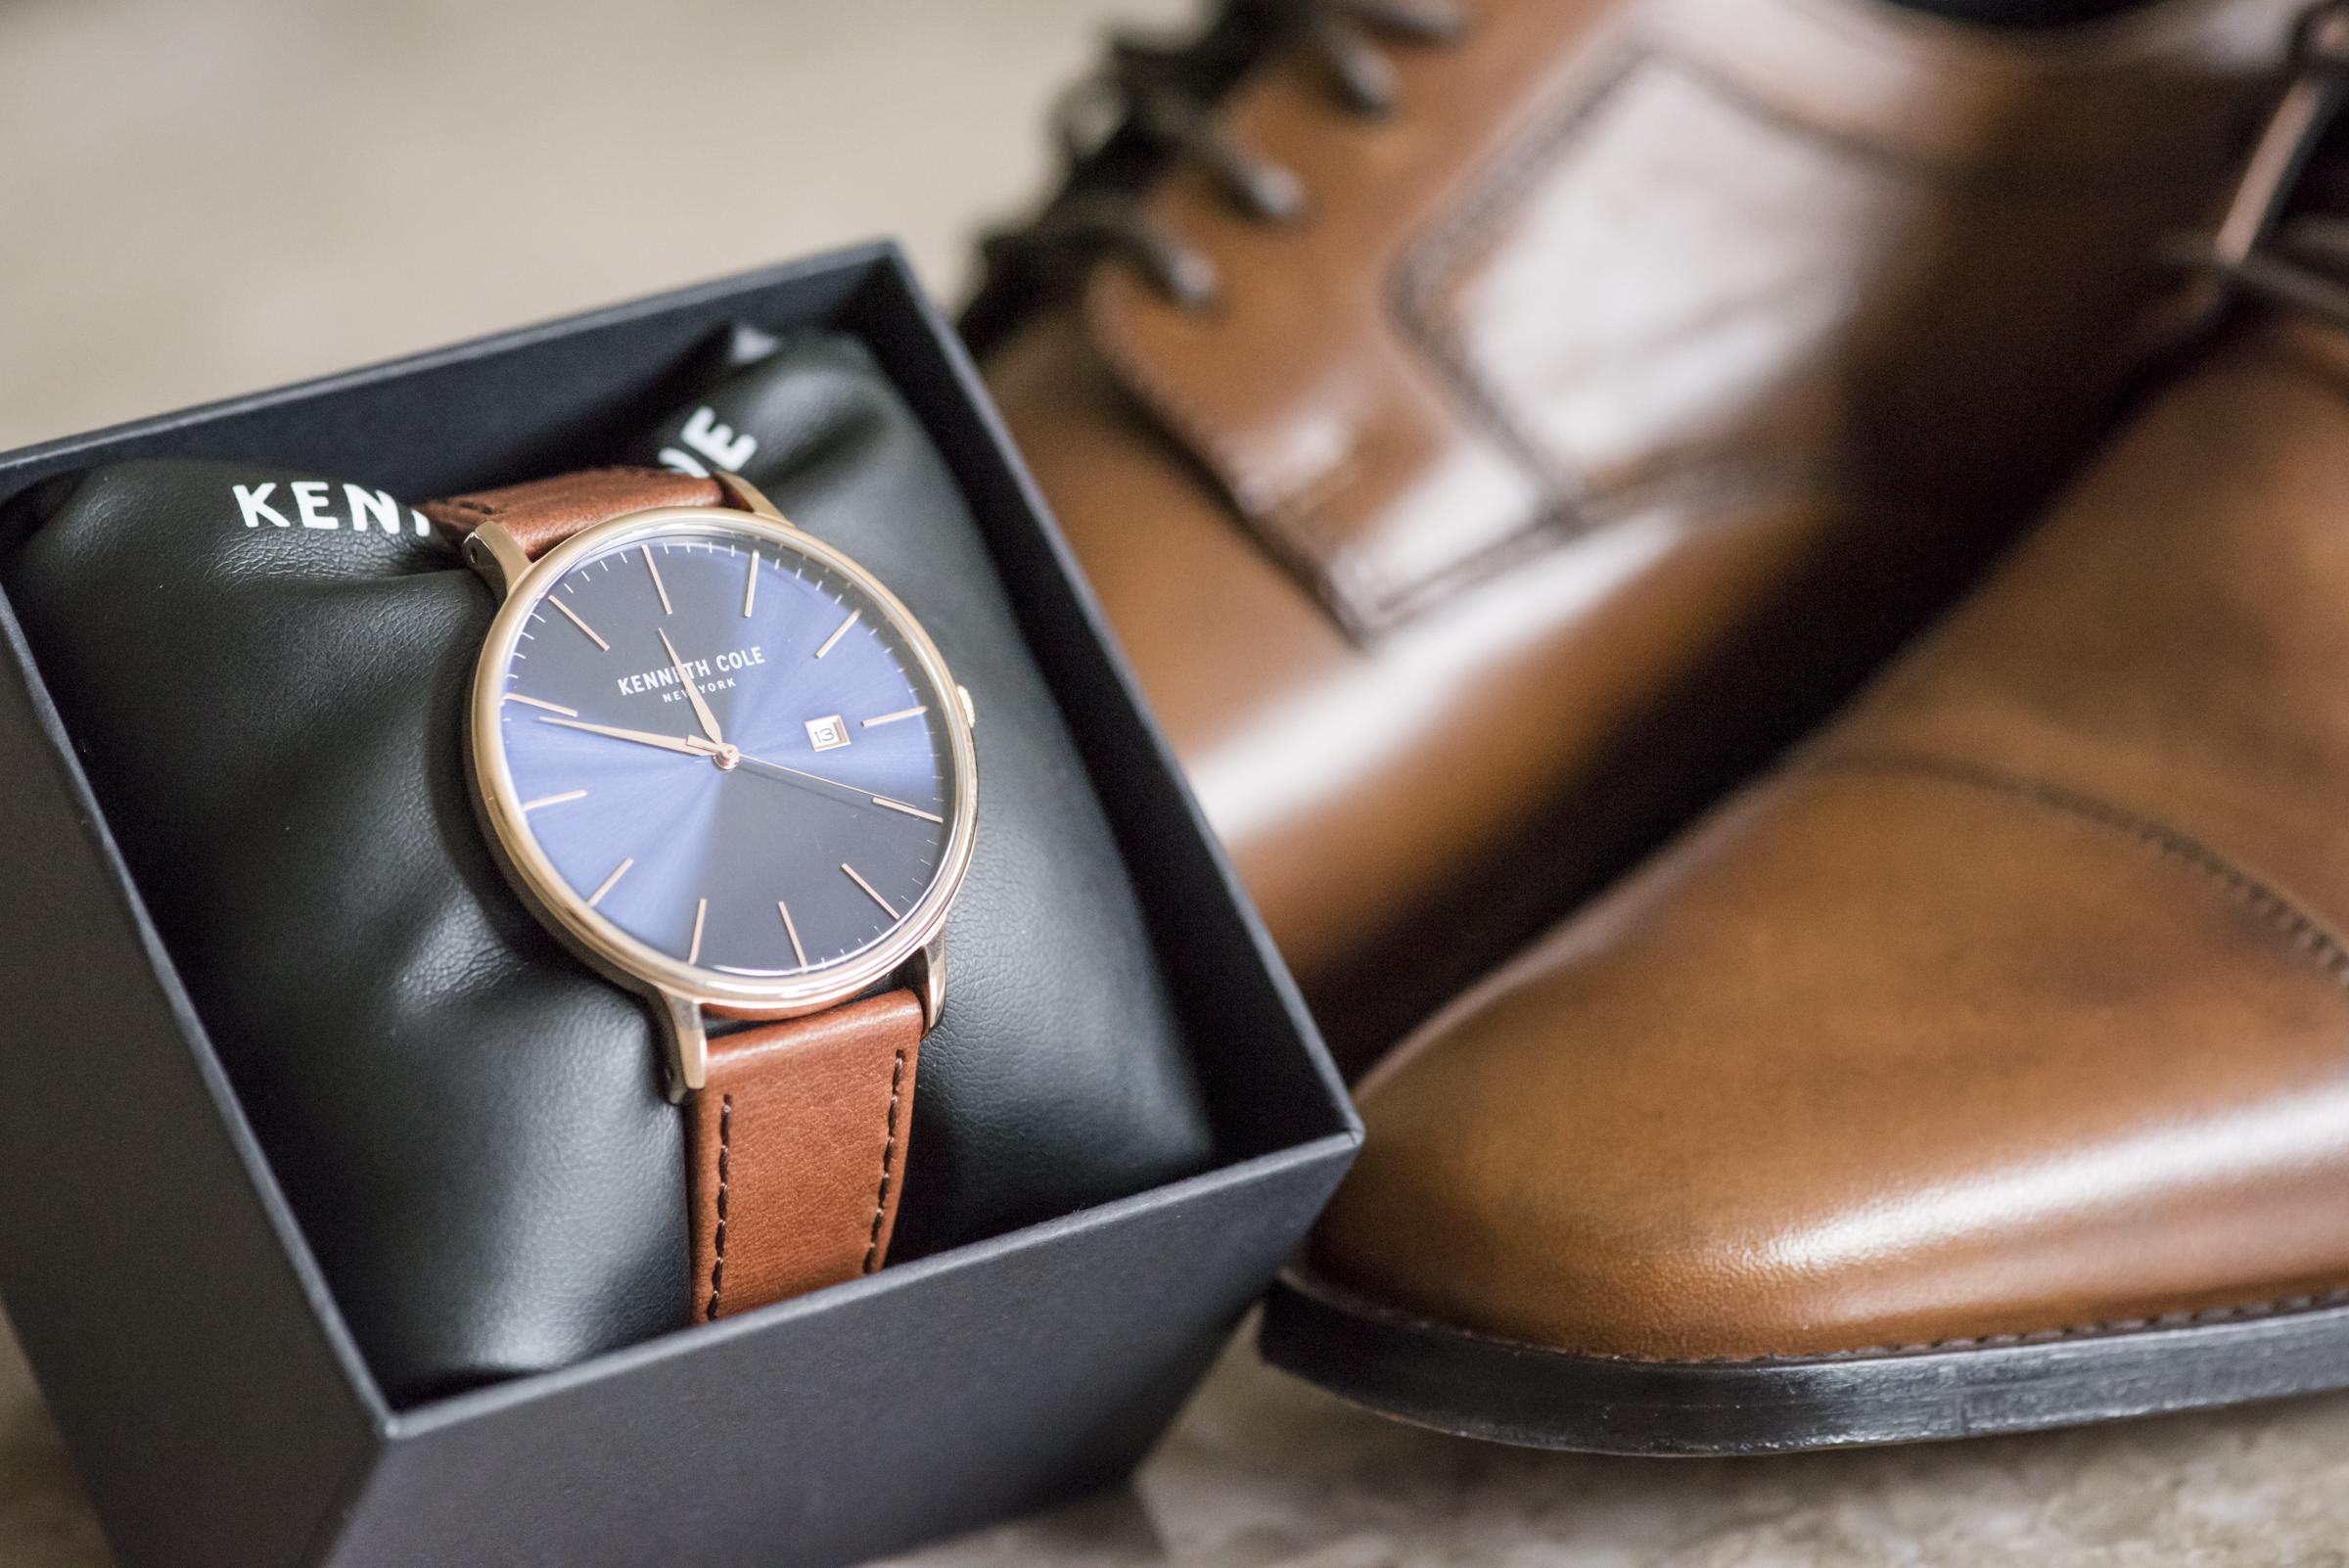 Watch-shoes-website001.jpg